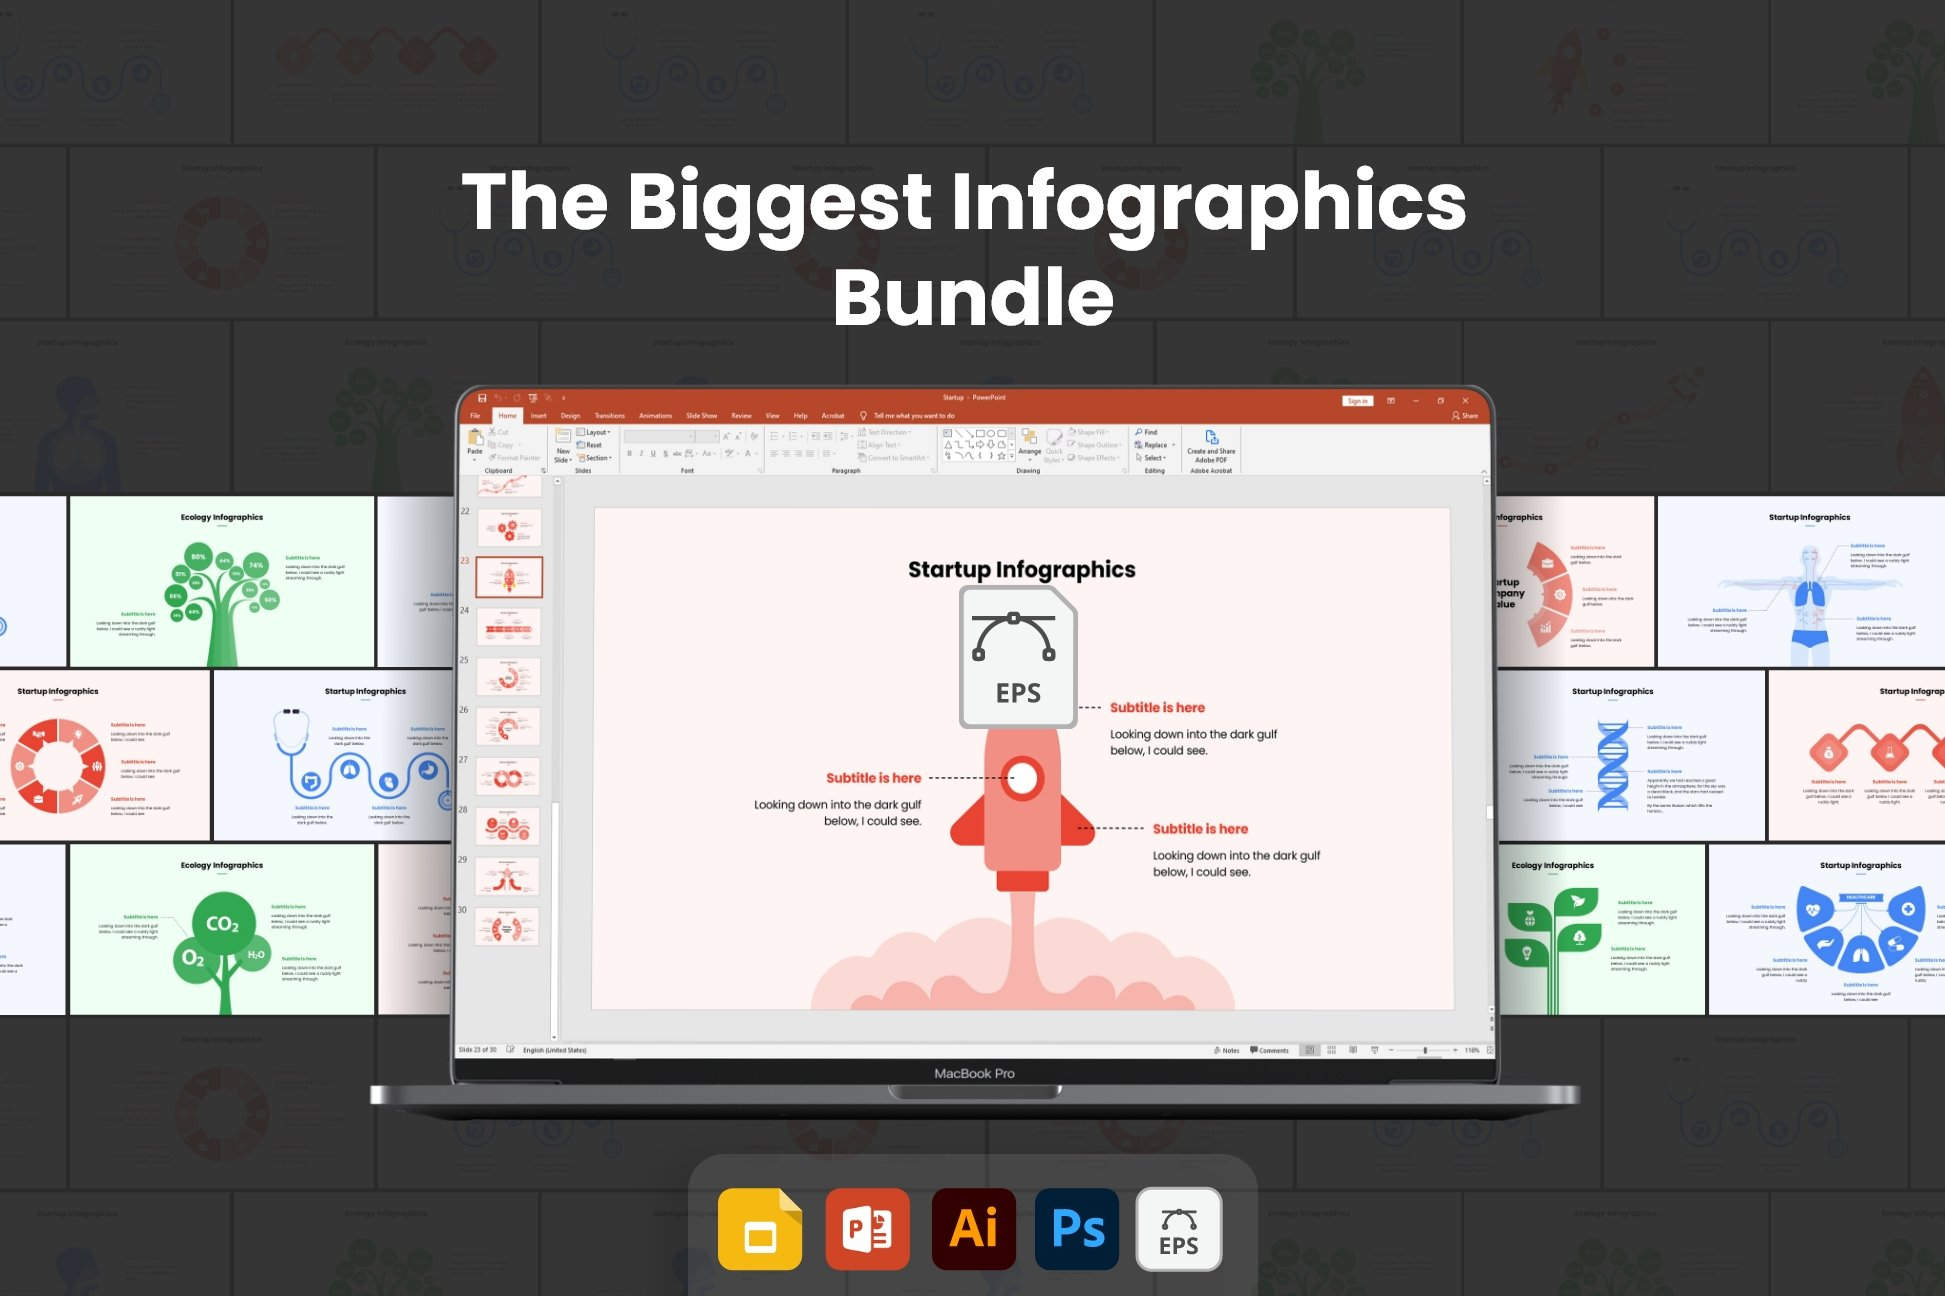 The biggest infographic bundle.